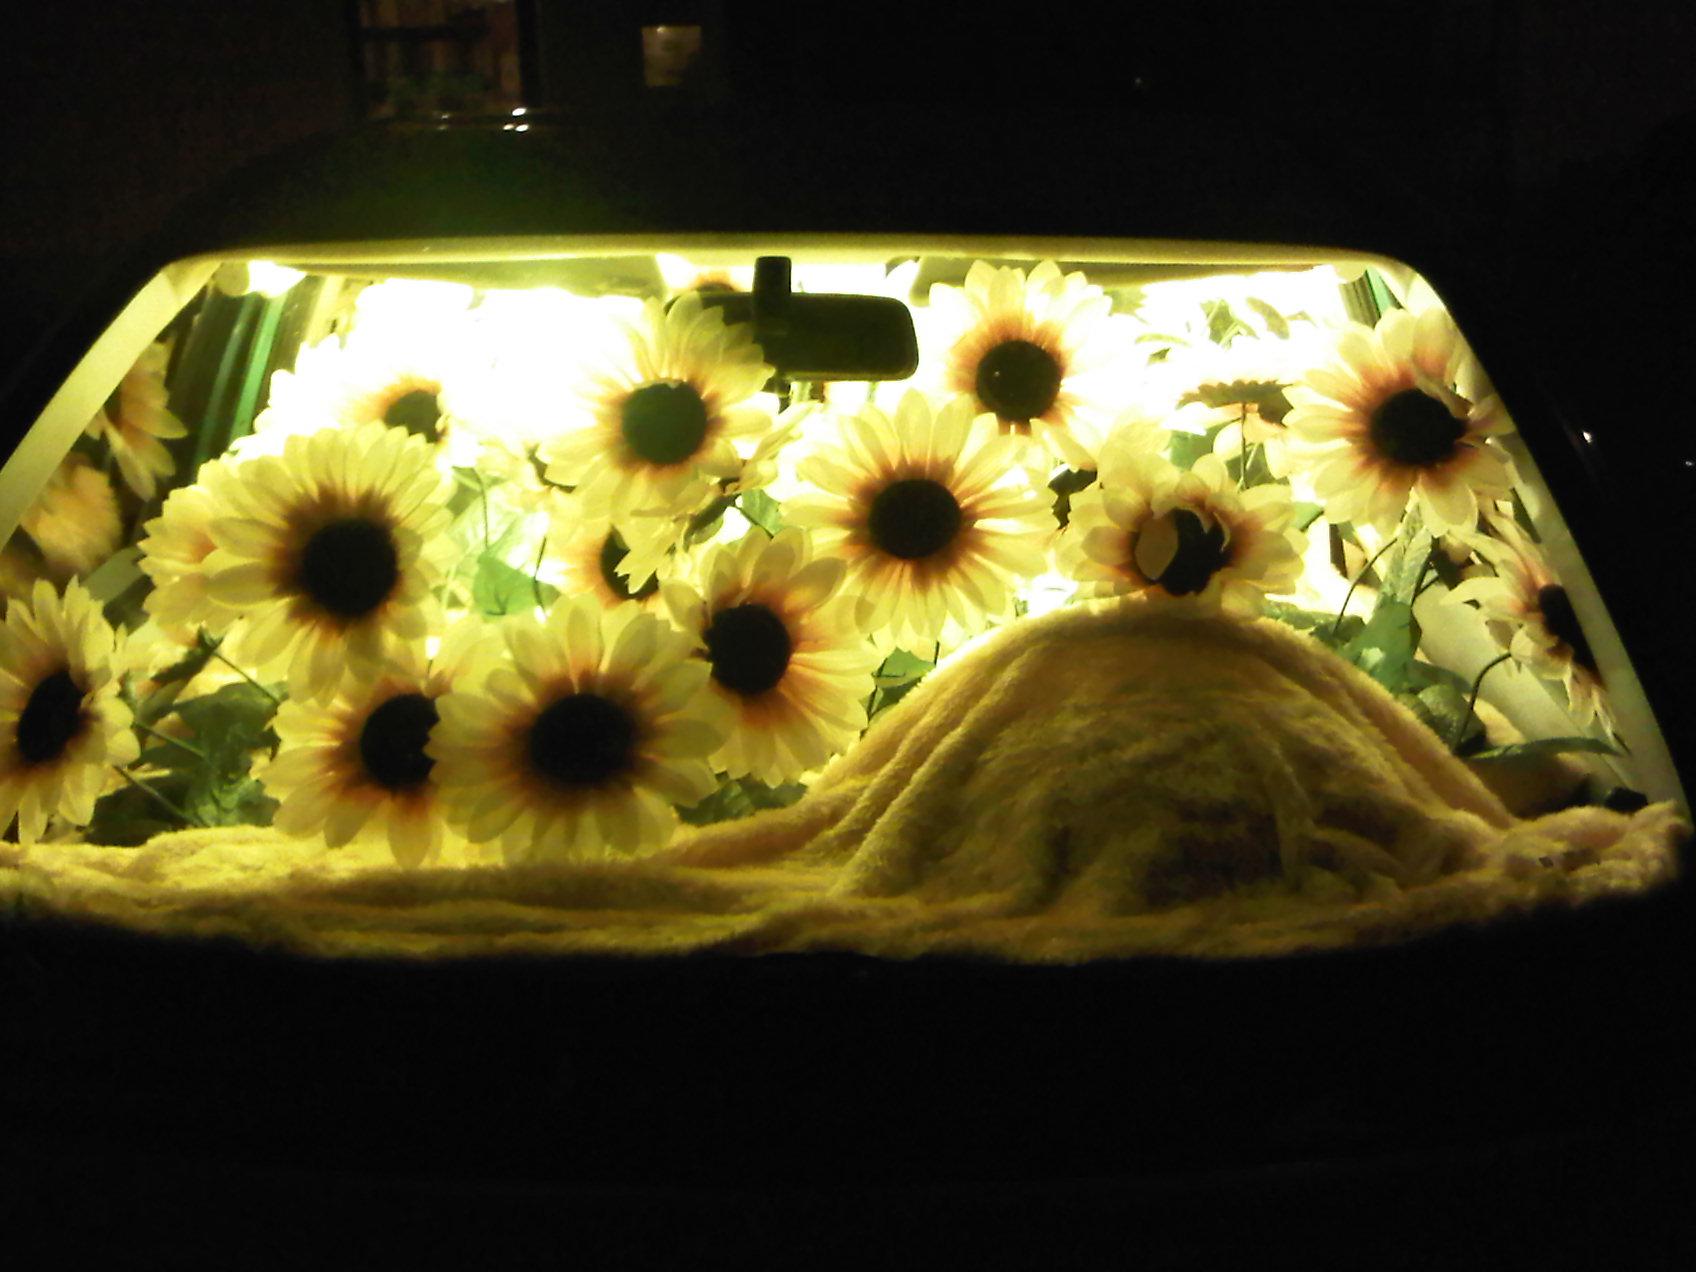 Sunflowers Need the Sun